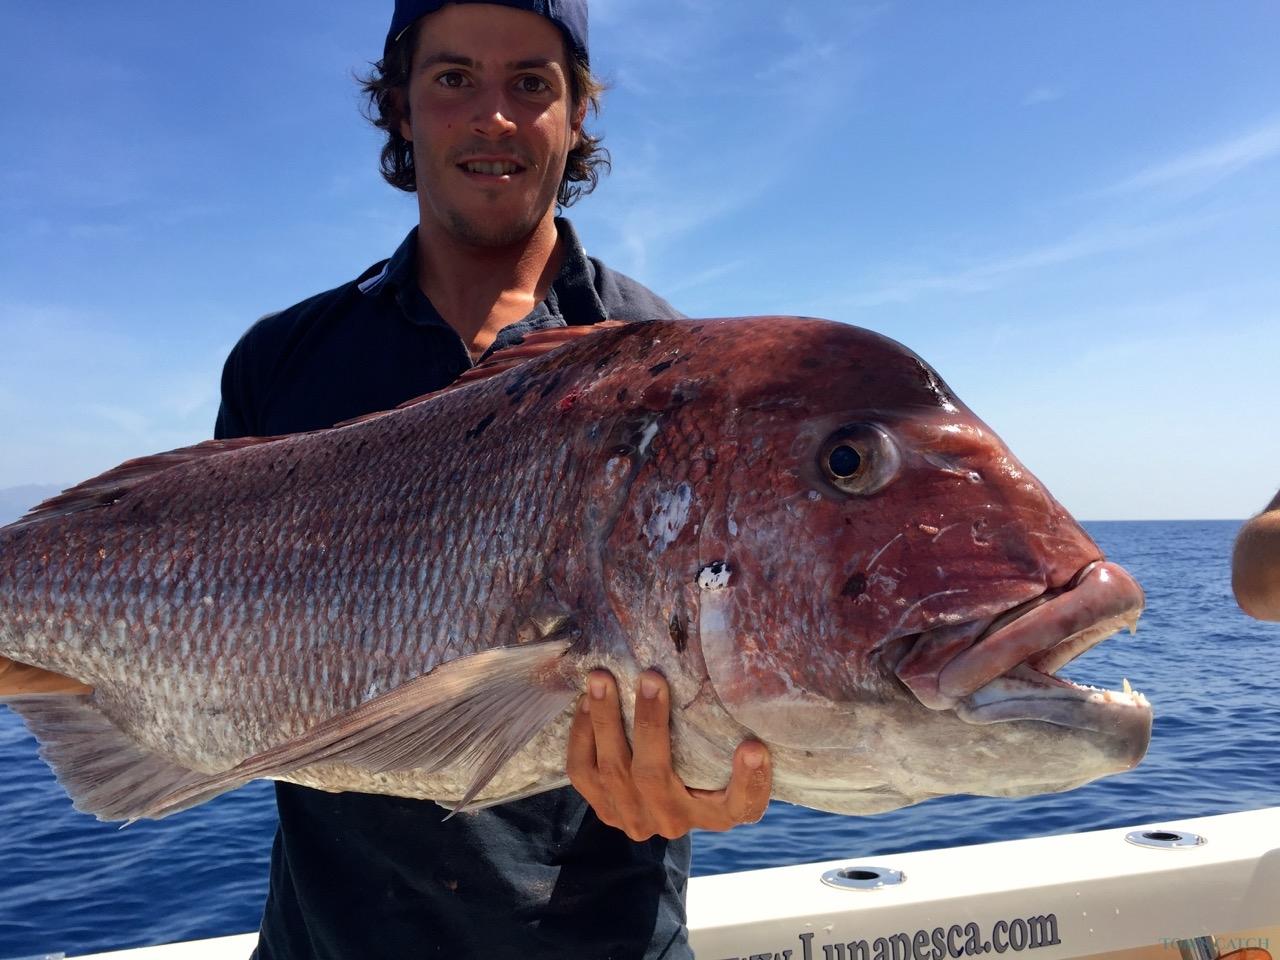 Marbella fishing zone